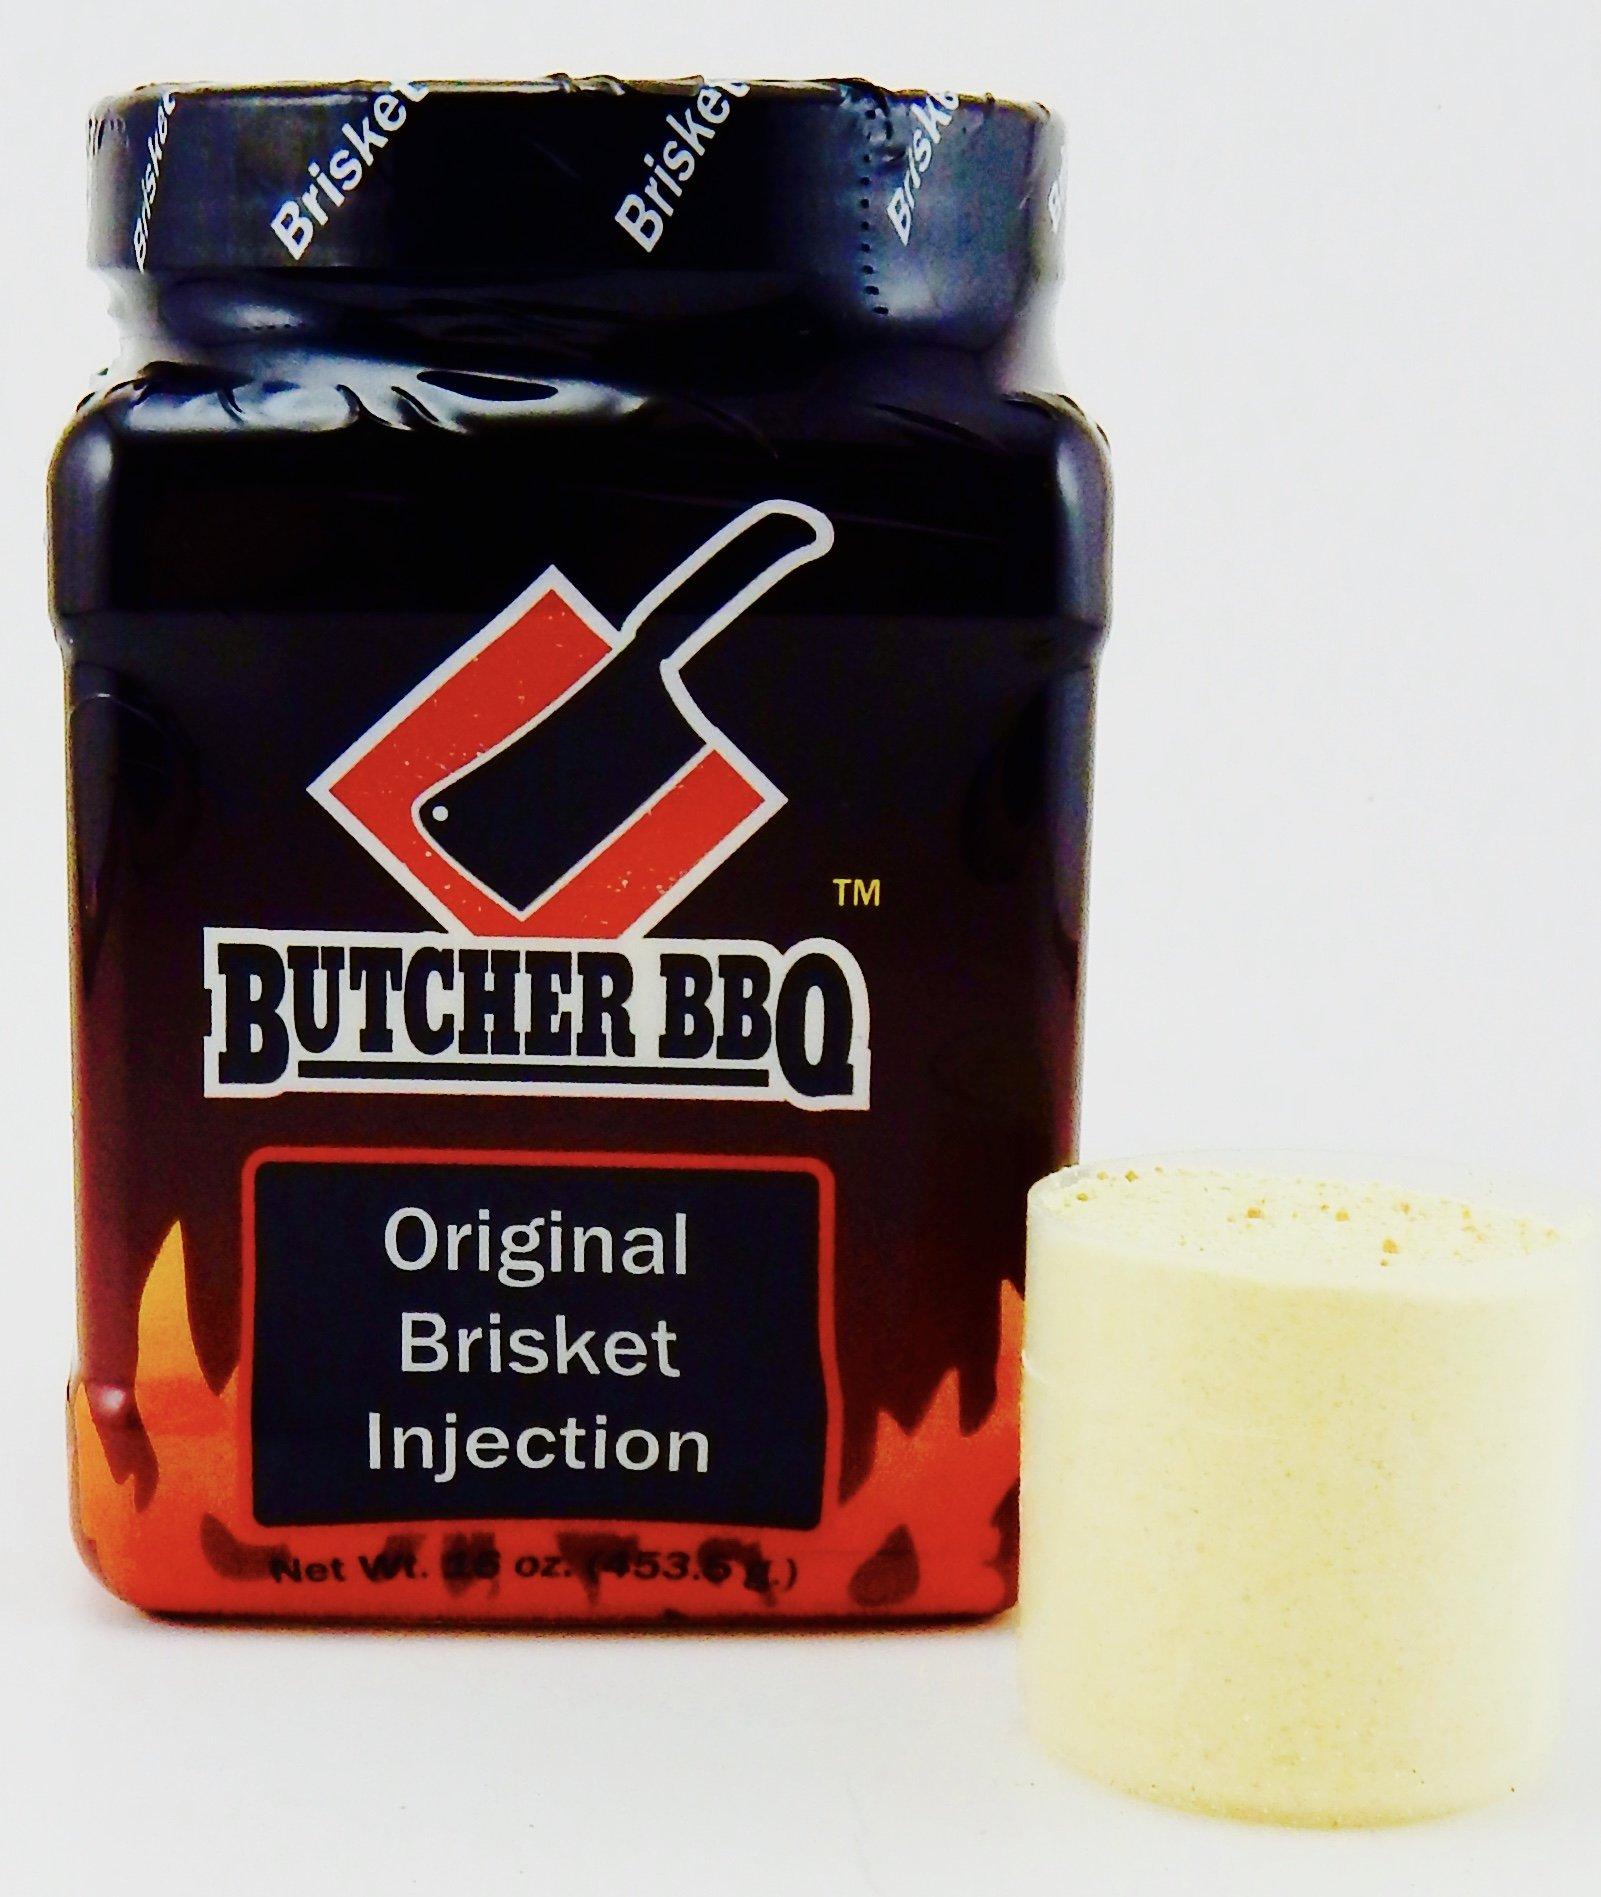 Butcher BBQ Original Brisket Injection 1 pound by Butcher BBQ (Image #1)